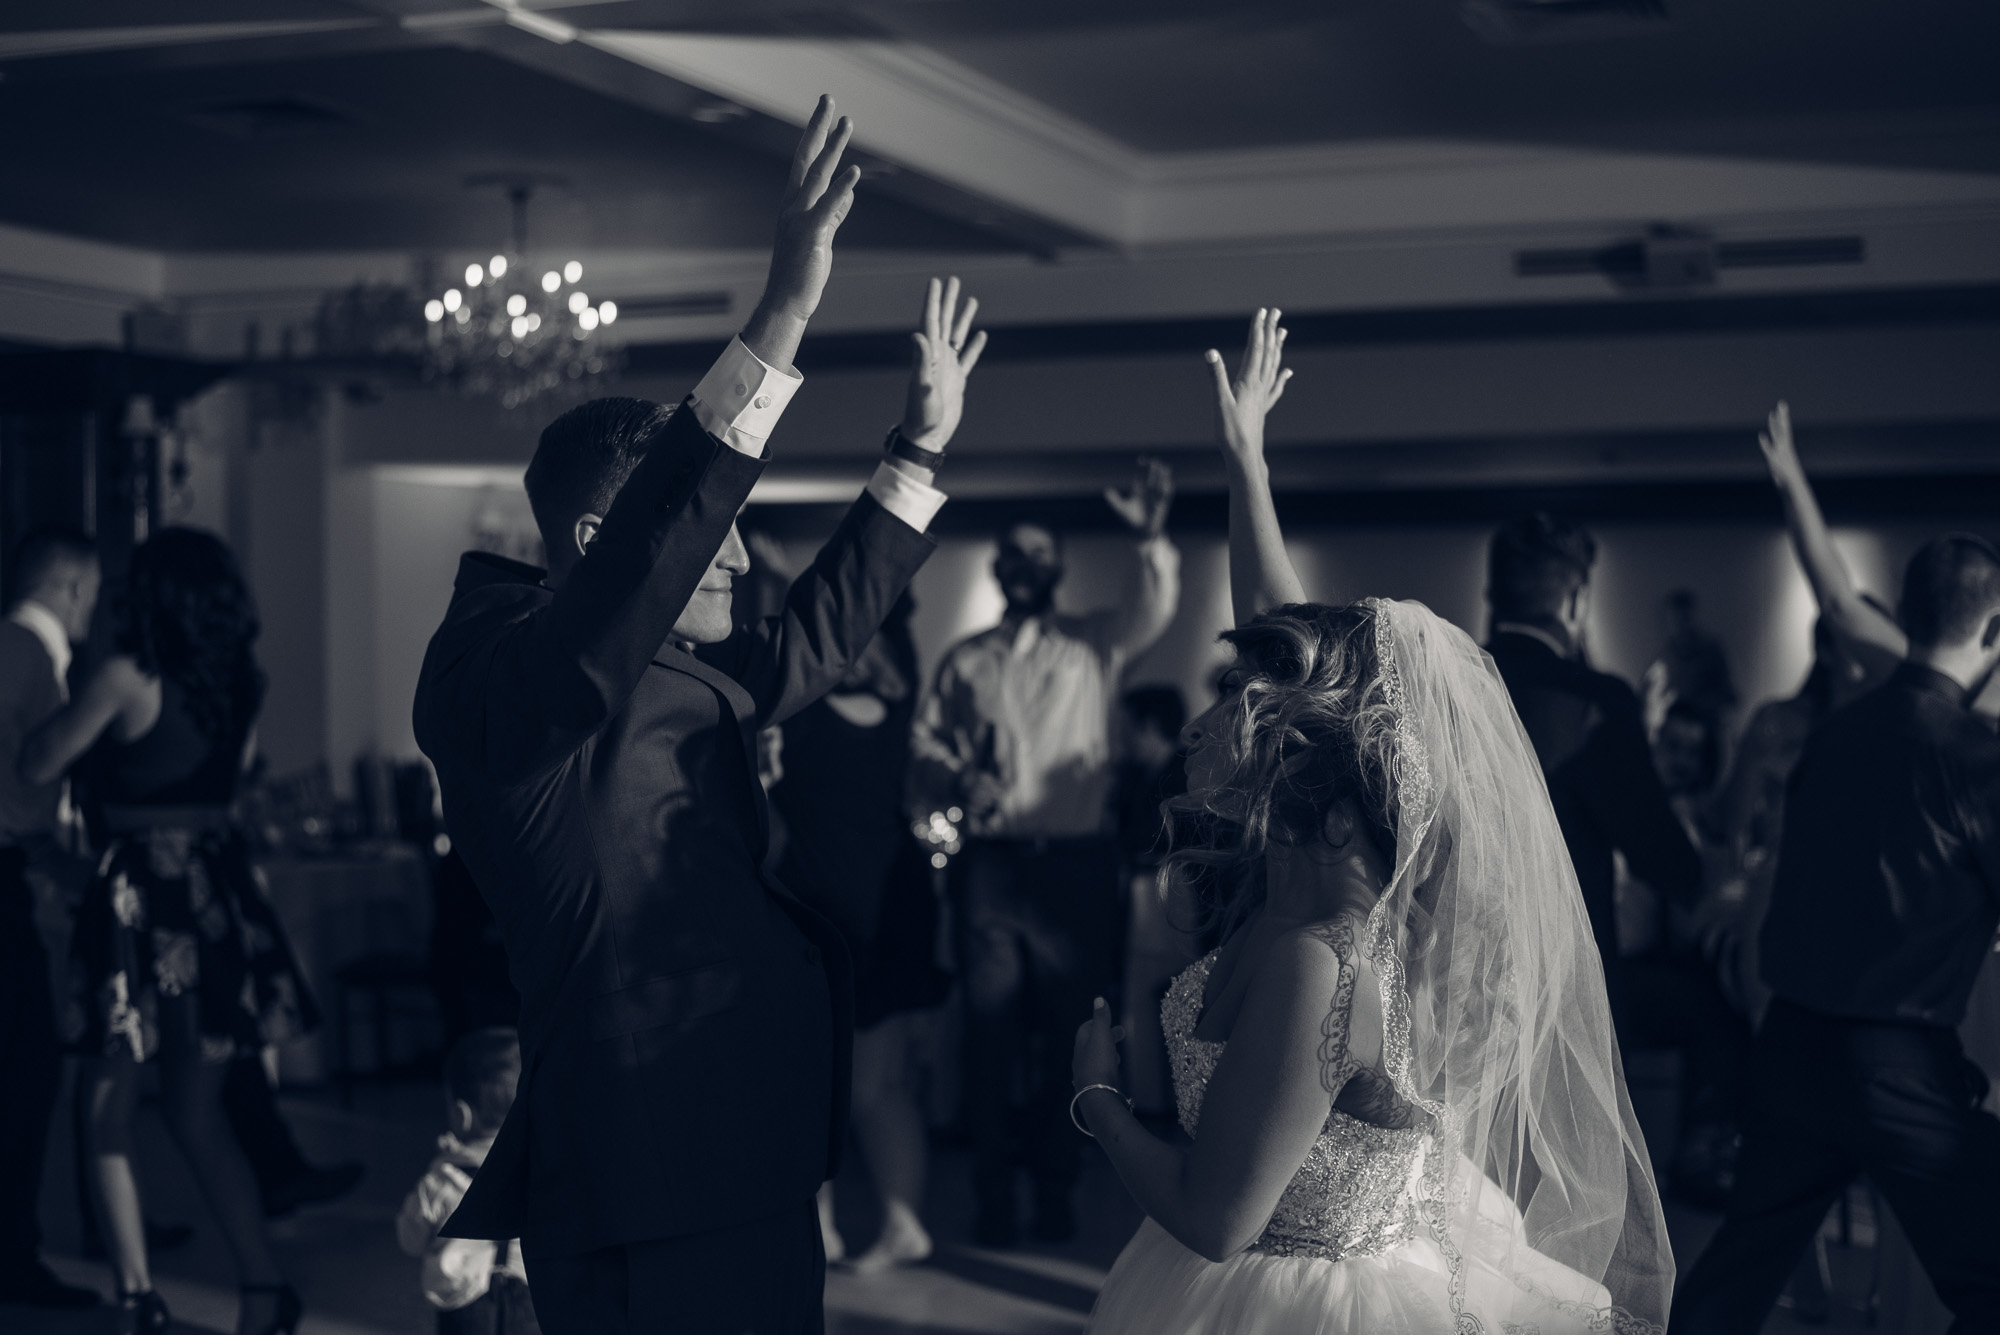 woodwinds_wedding_171020_web-63.jpg